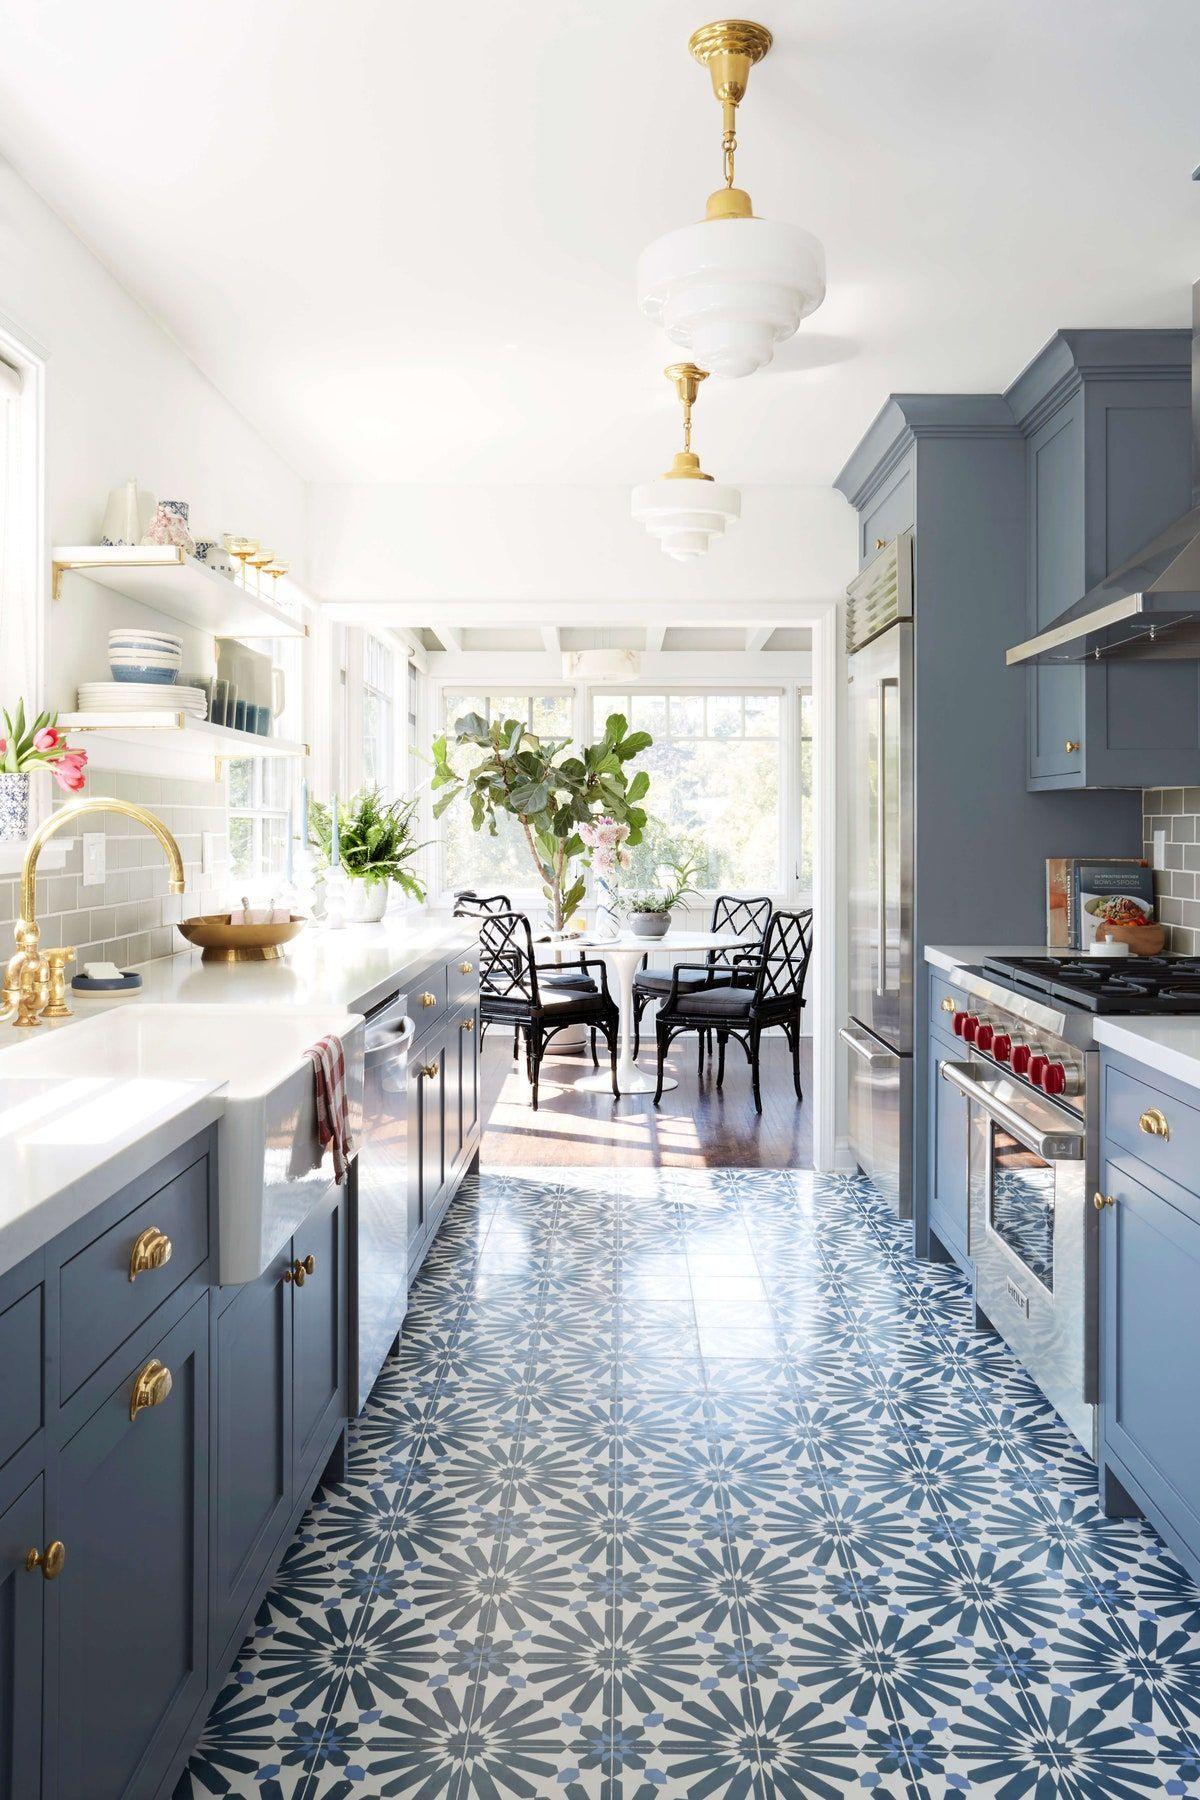 Small Galley Kitchen Ideas Design Inspiration In 2020 Galley Kitchen Design Kitchen Design Small Kitchen Floor Tile